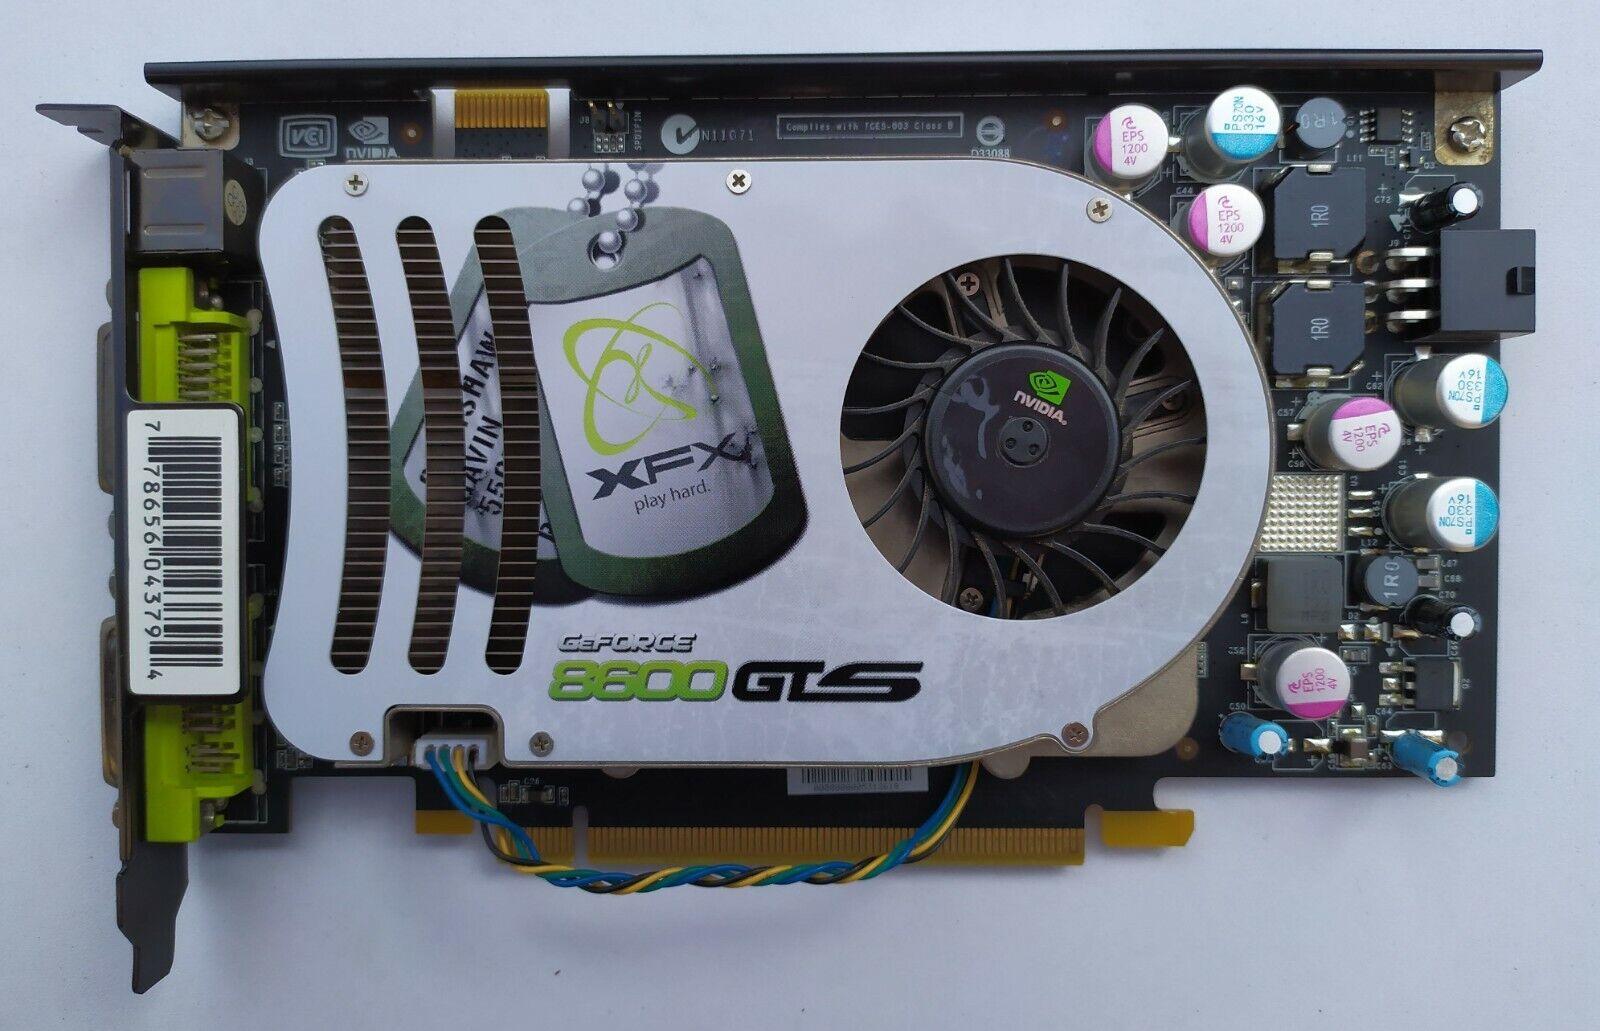 PC VGA Video Card NVIDIA GeForce 8600 GTS 256mb ddr3 XFX